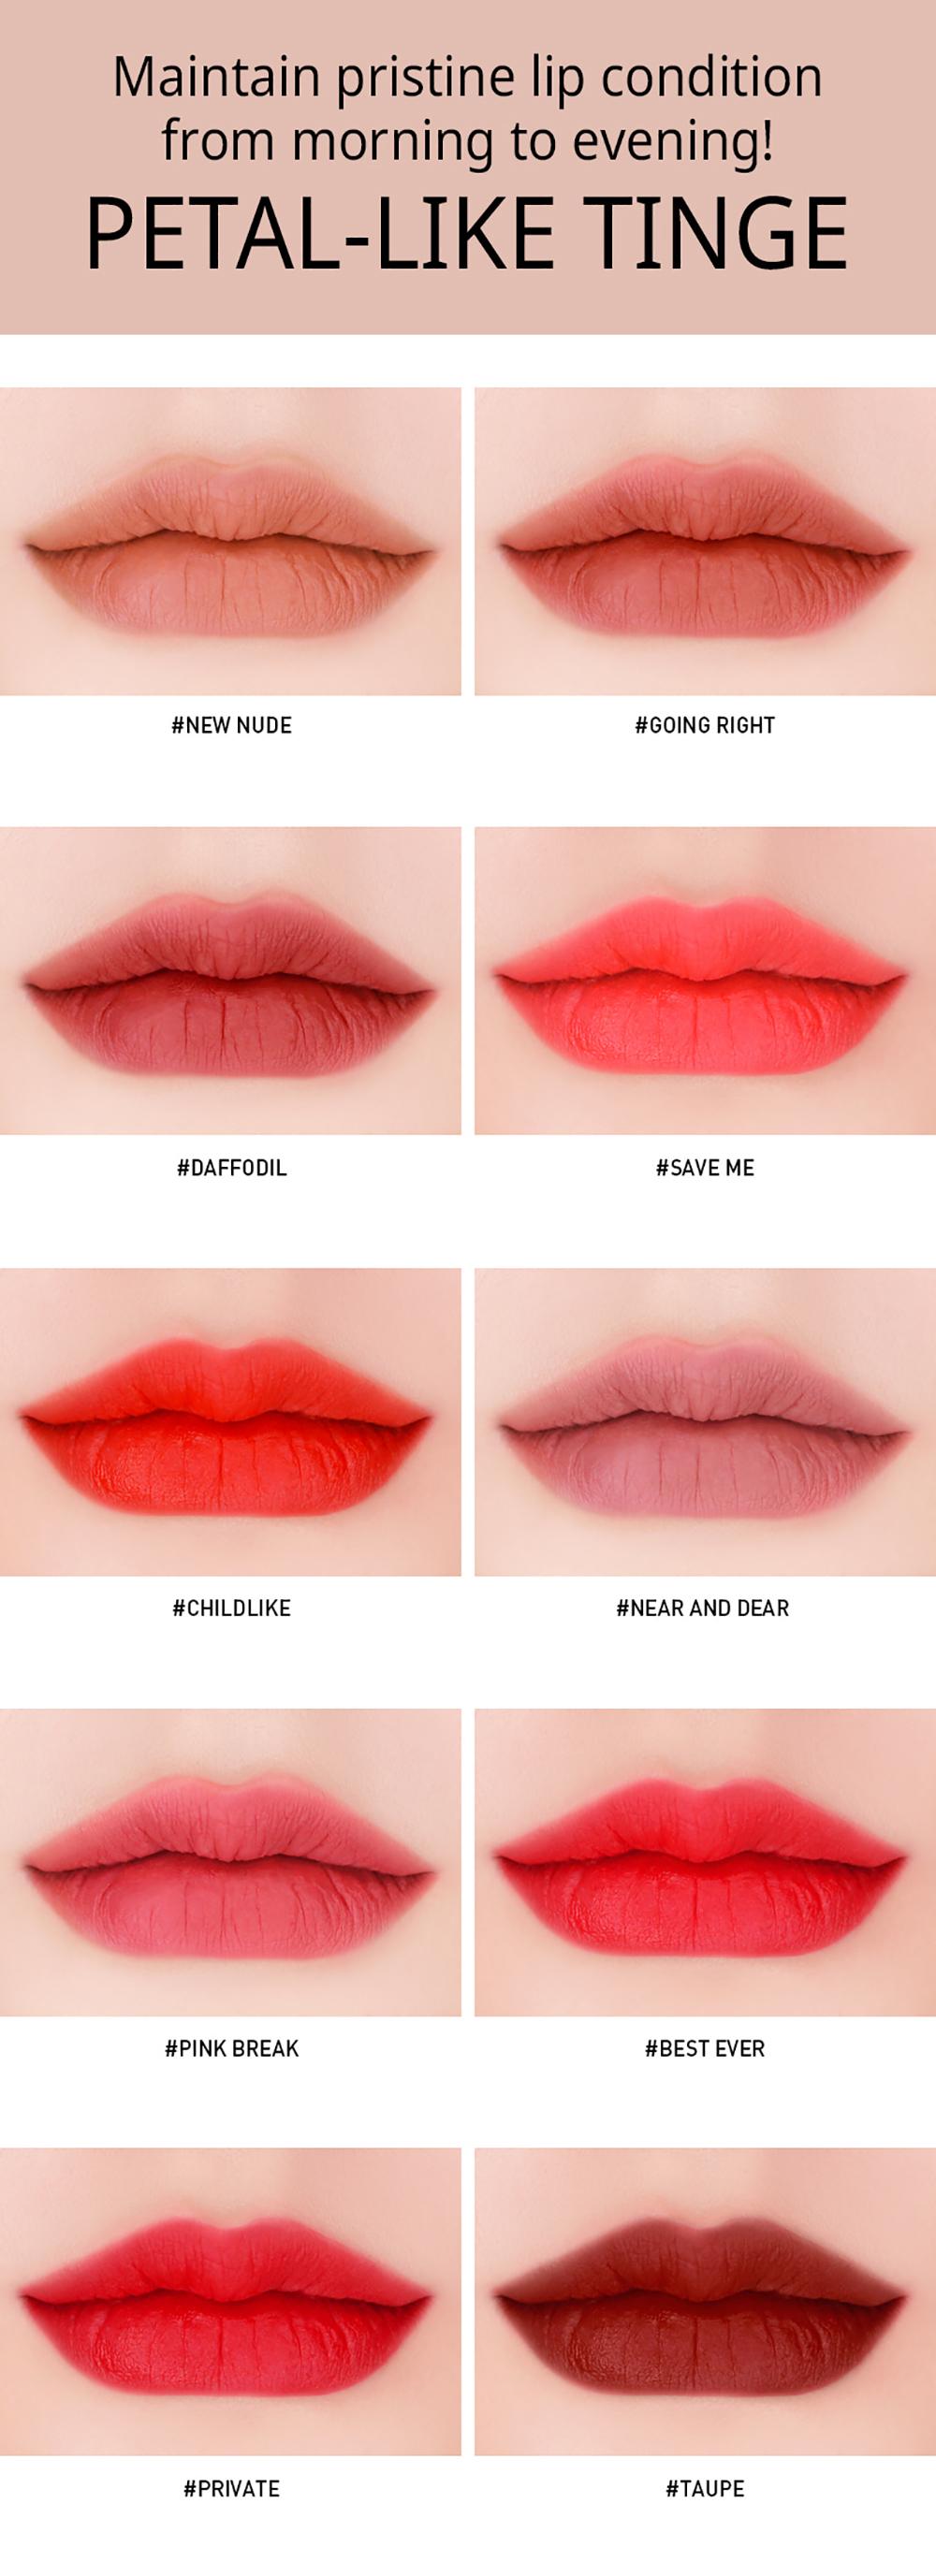 3CE Velvet Lip Tint #New Nude_2